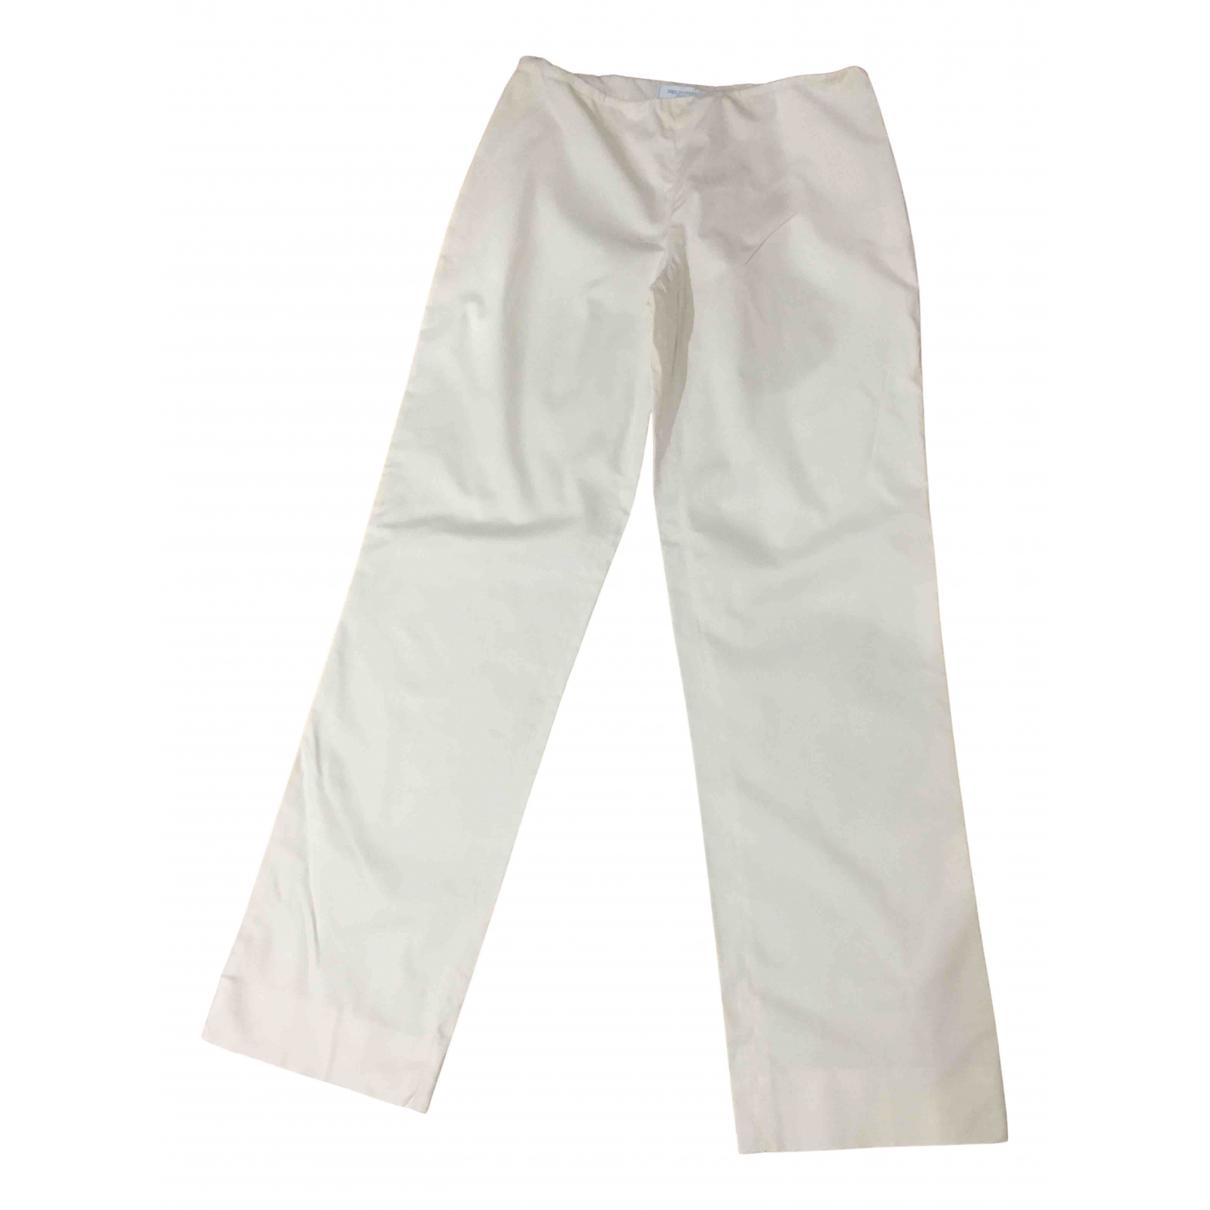 Emilio Pucci N Ecru Cotton Trousers for Women 8 UK